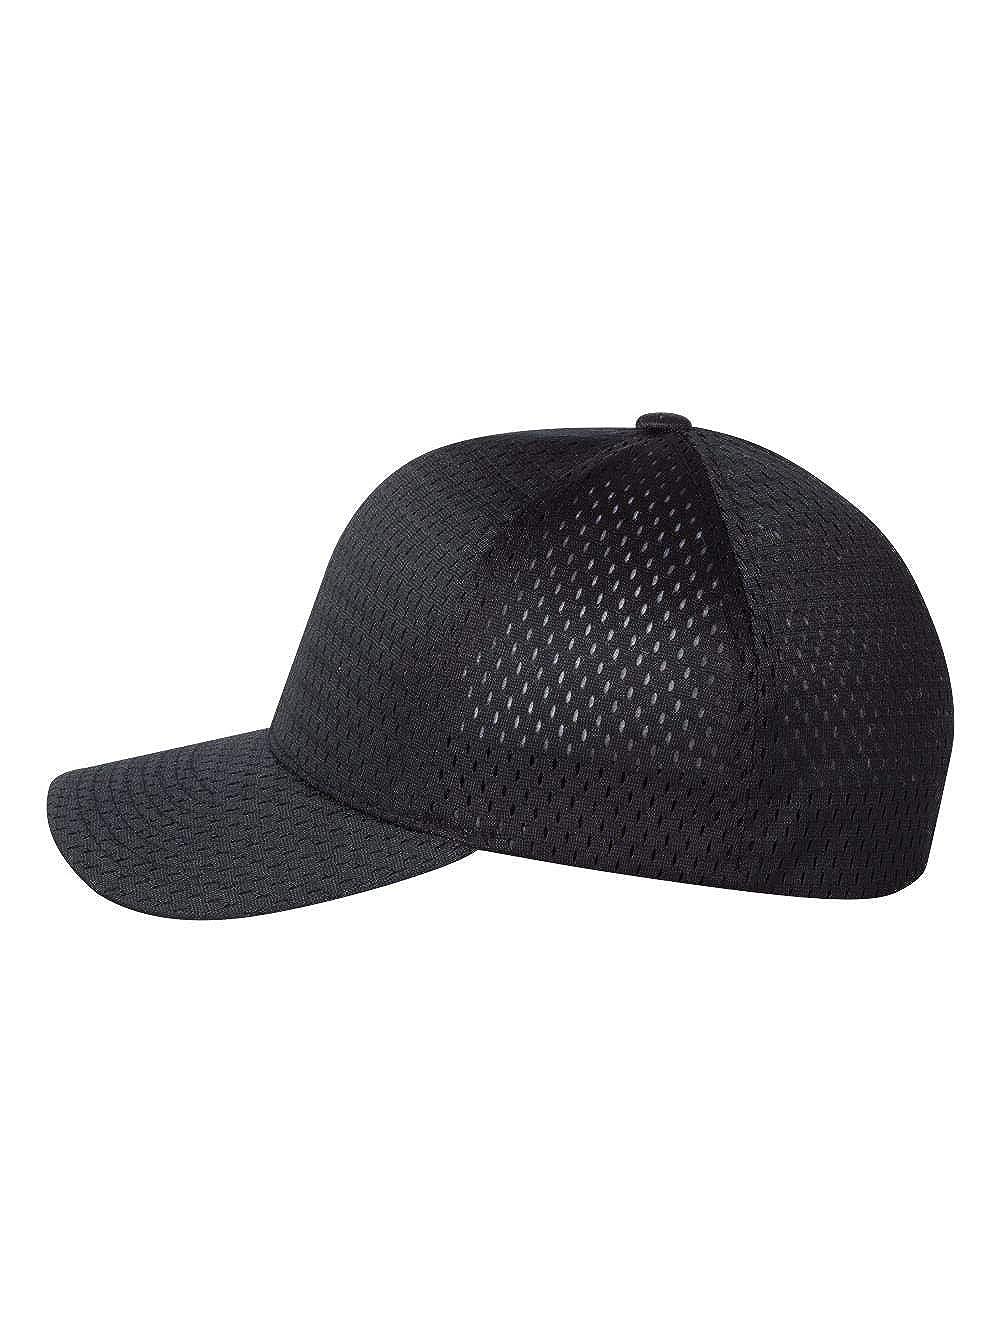 d71f627c6 Flexfit - Athletic Mesh Cap - 6777